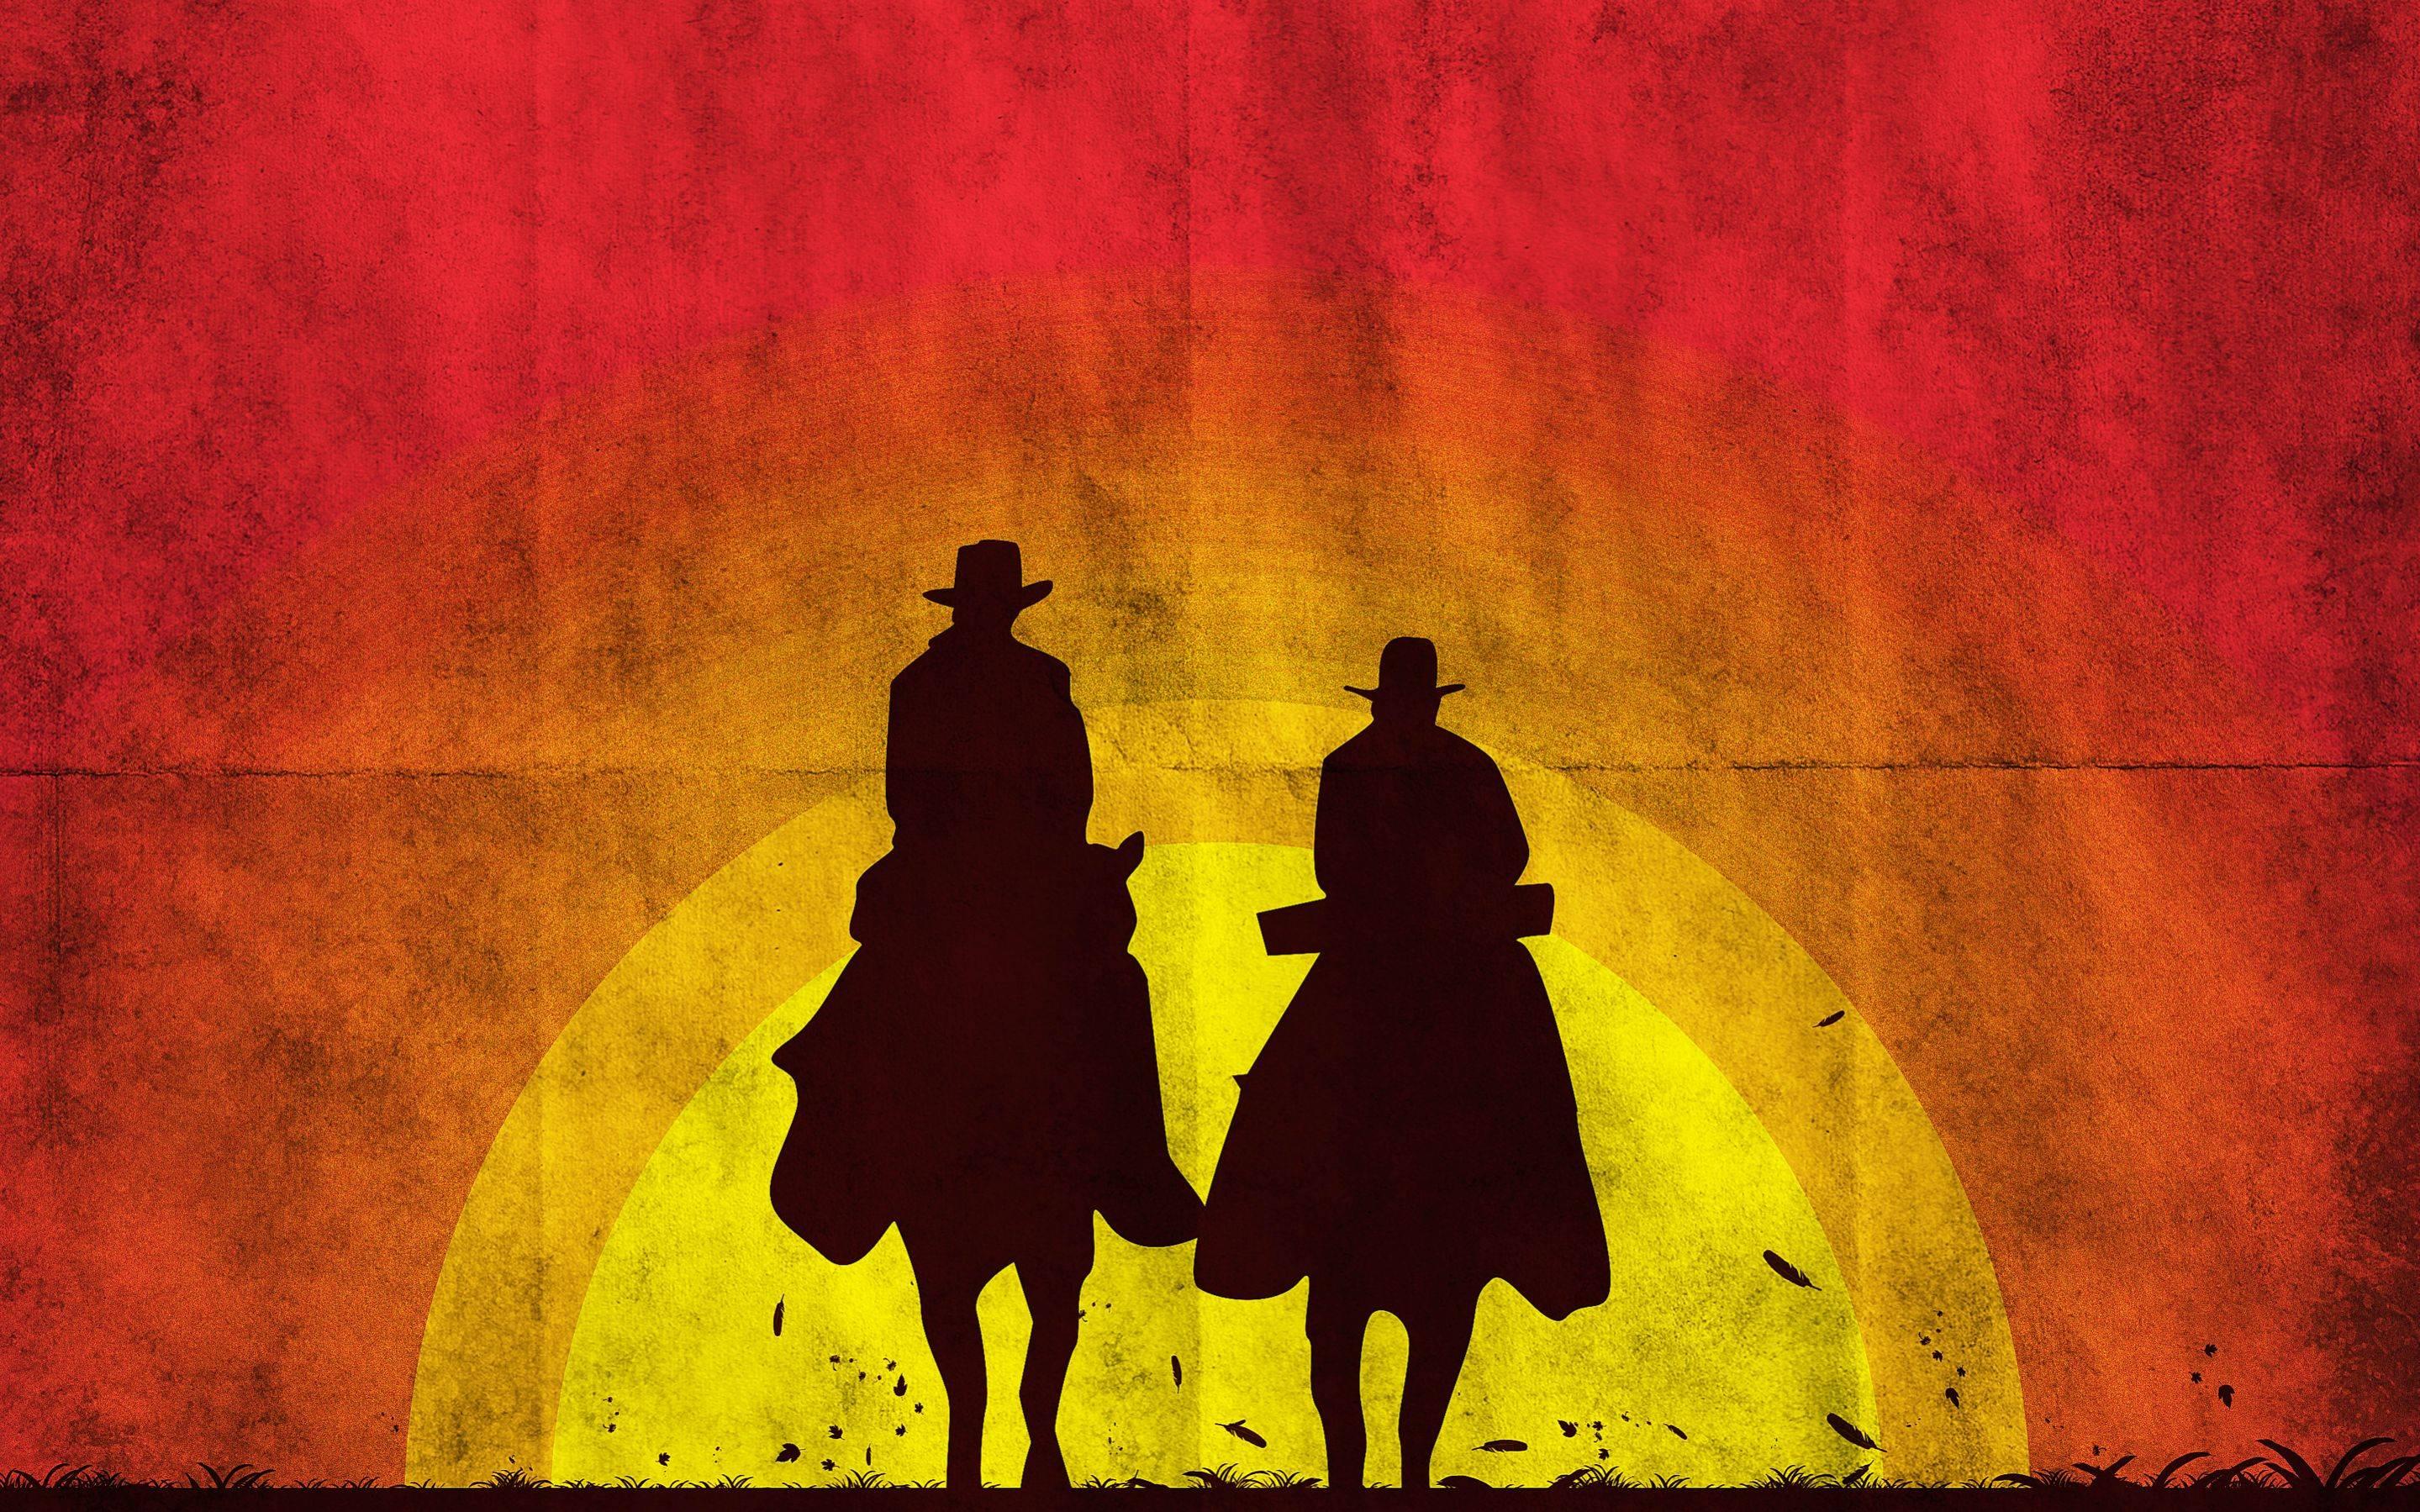 download Pics Photos Django Unchained Movie Hd Wallpaper Hd 2879x1799